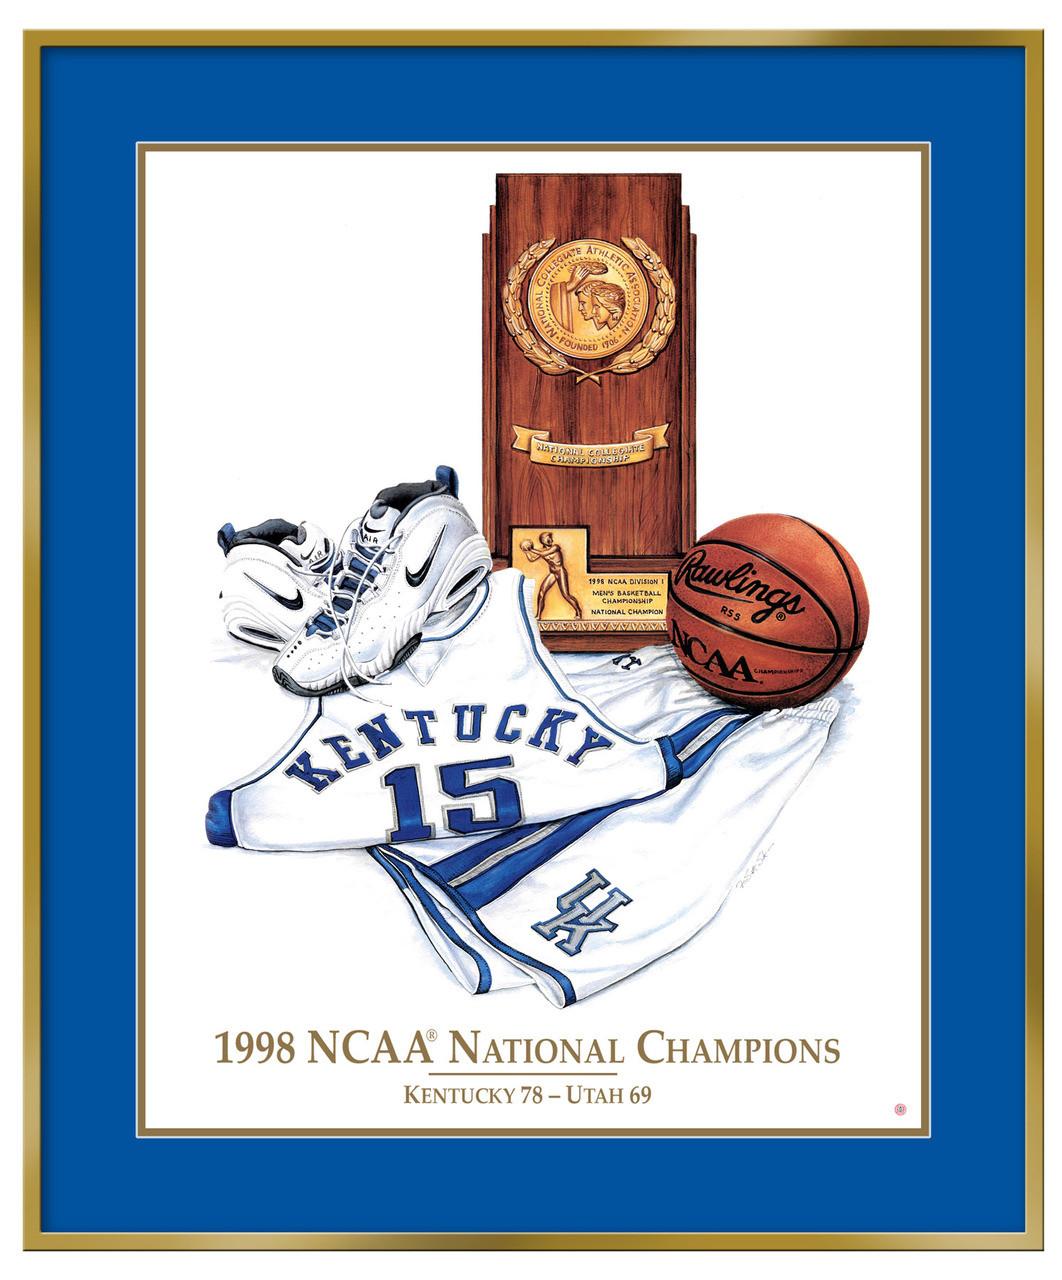 photo relating to Printable Uk Basketball Schedule titled Kentucky 1998 NCAA Champions